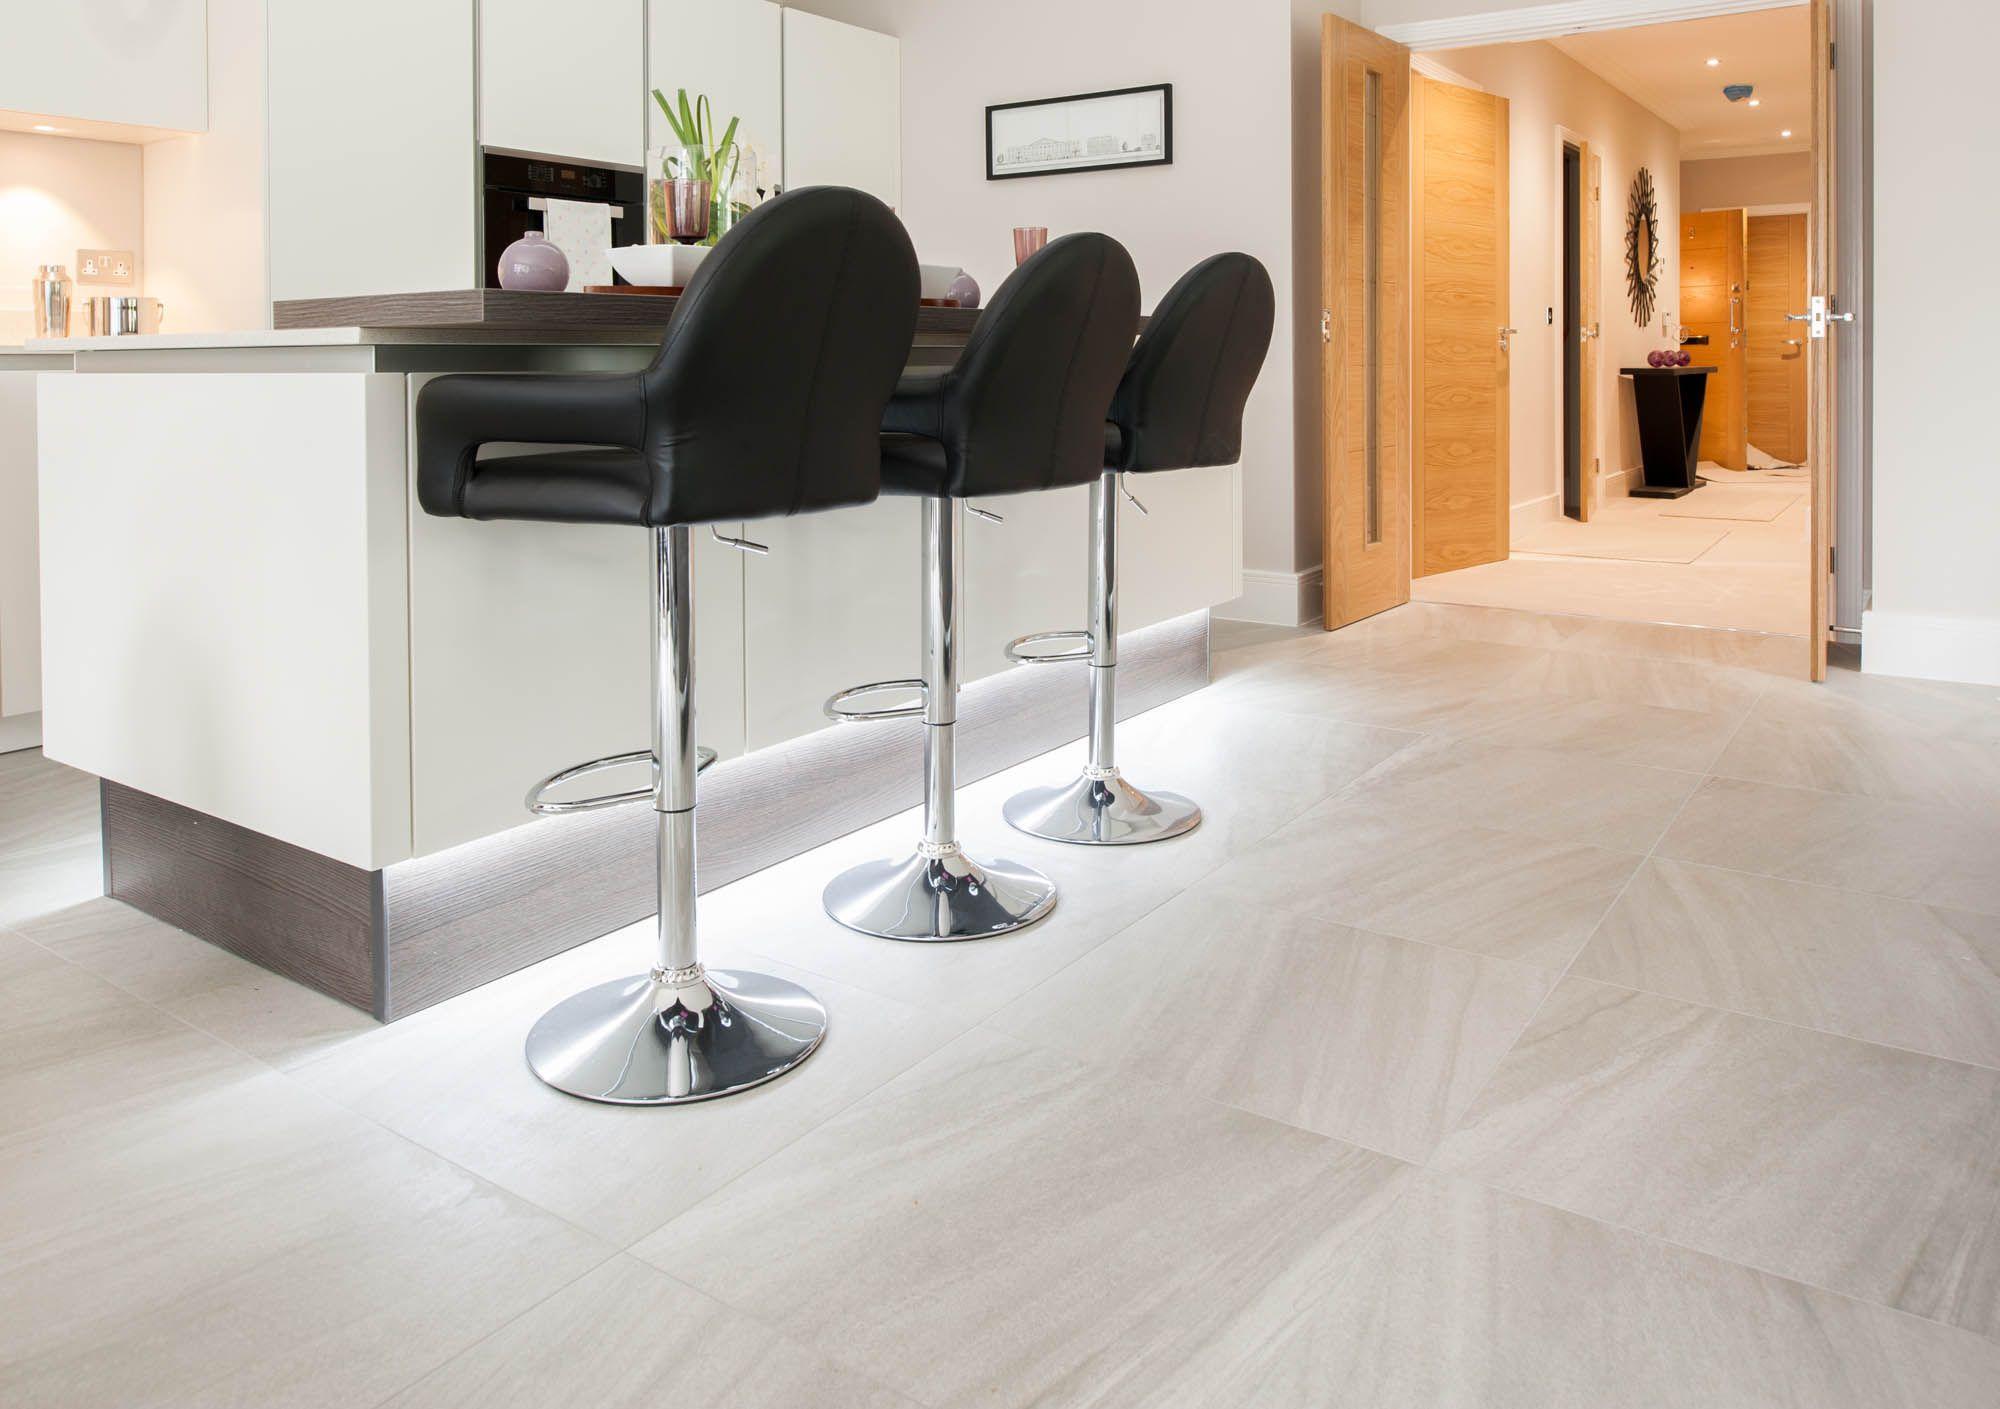 Floor Tiles: Stockholm Lysgrau 60 x 60 cm. This grey stone effect ...